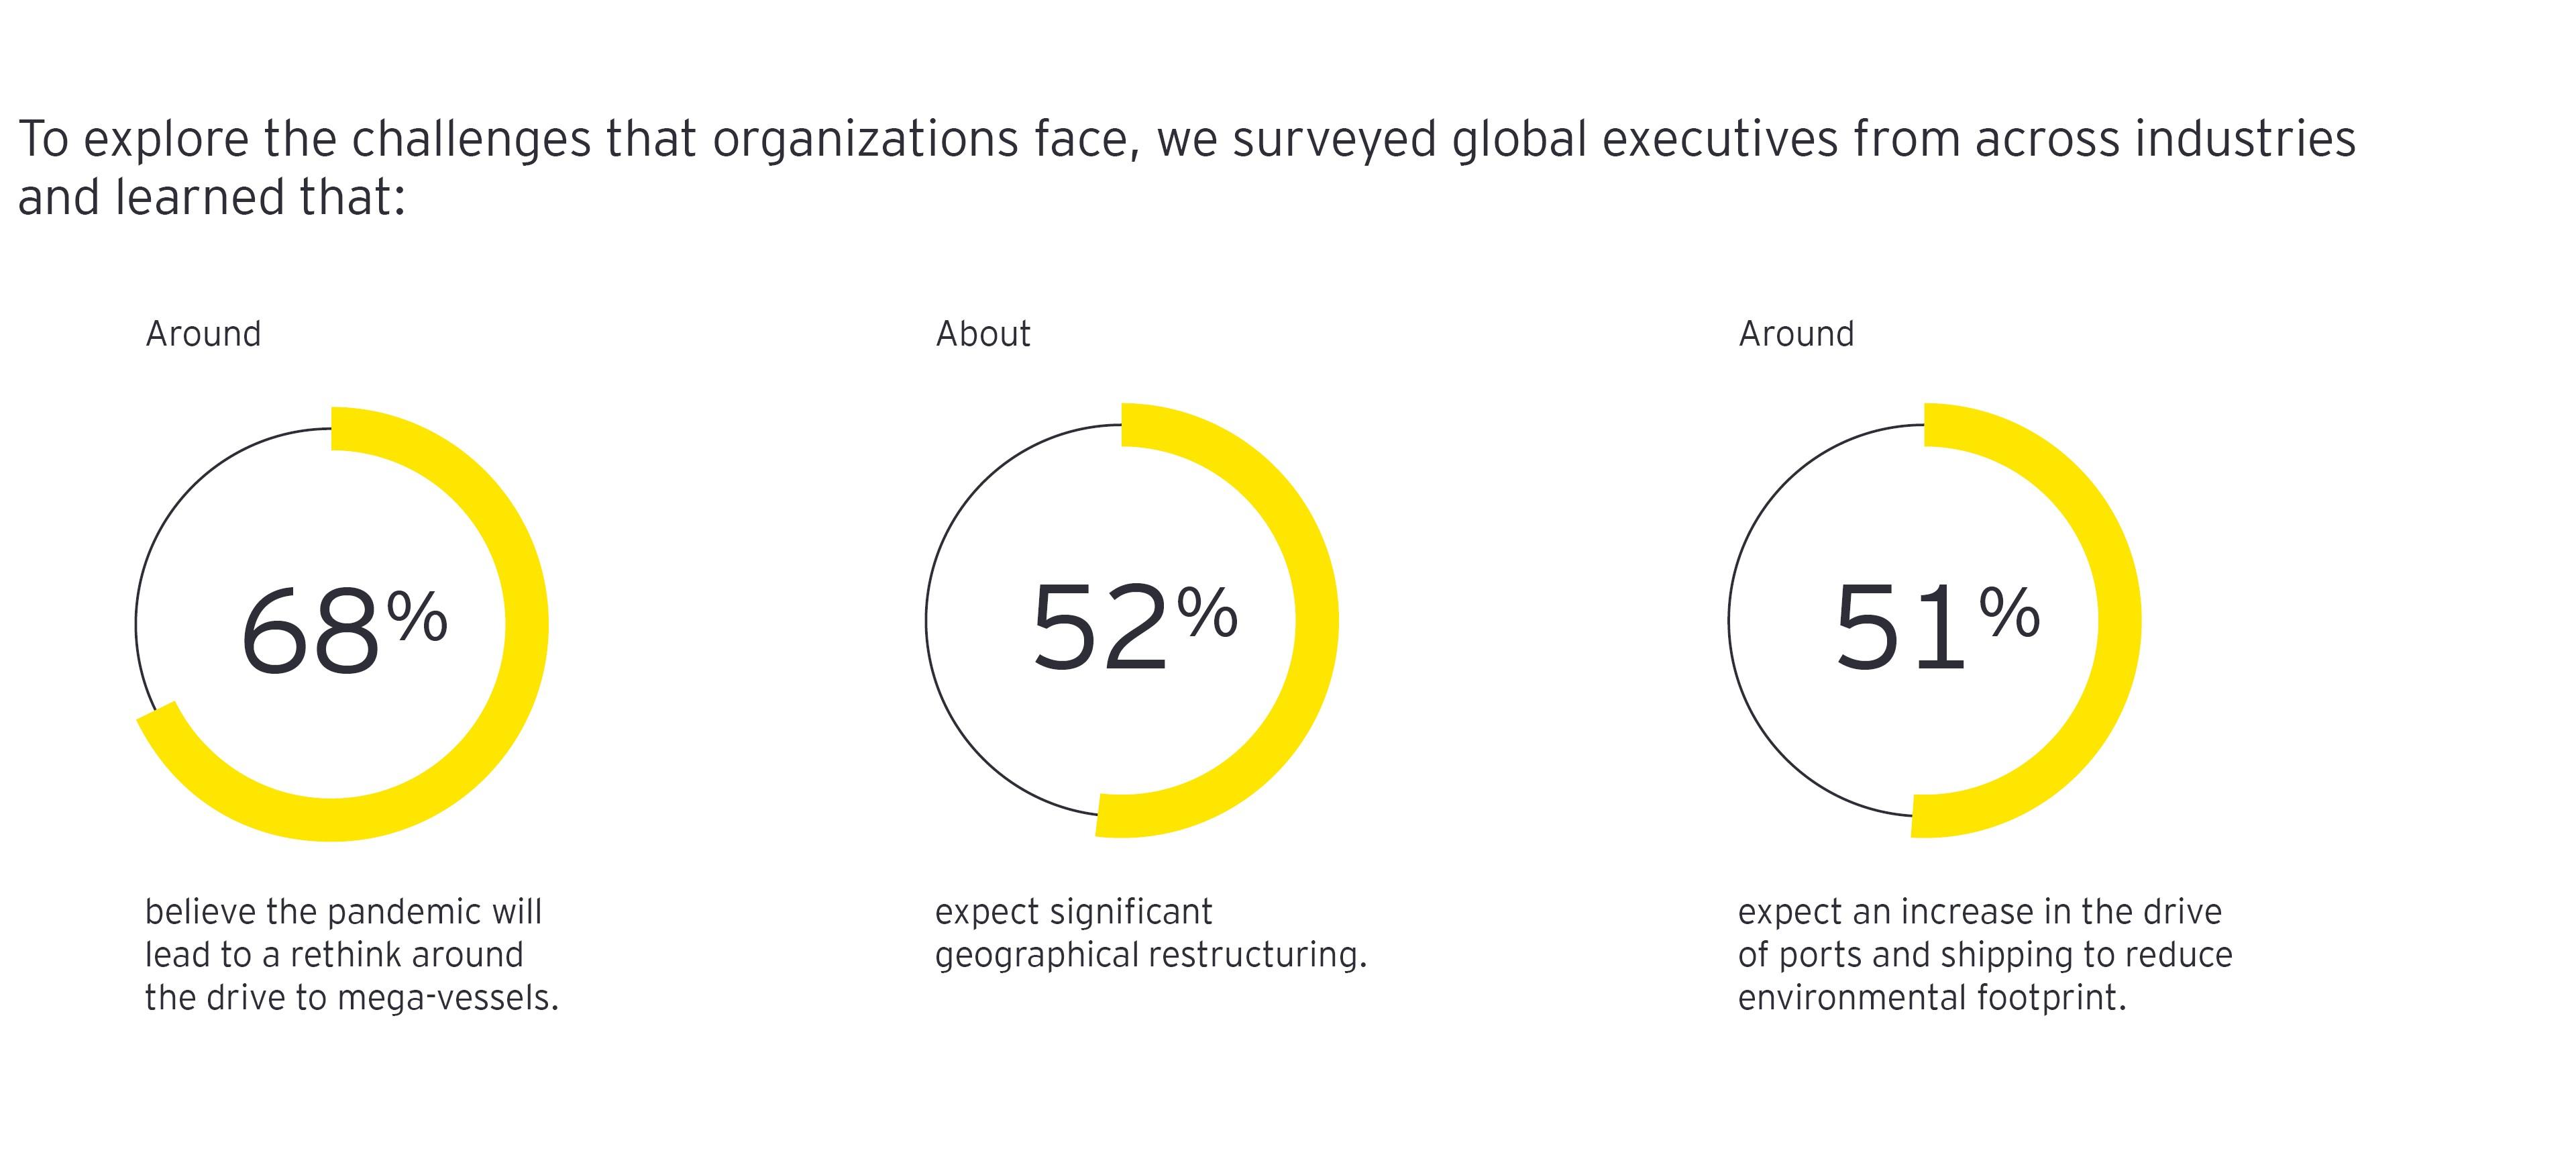 Global executives surveyed across industries